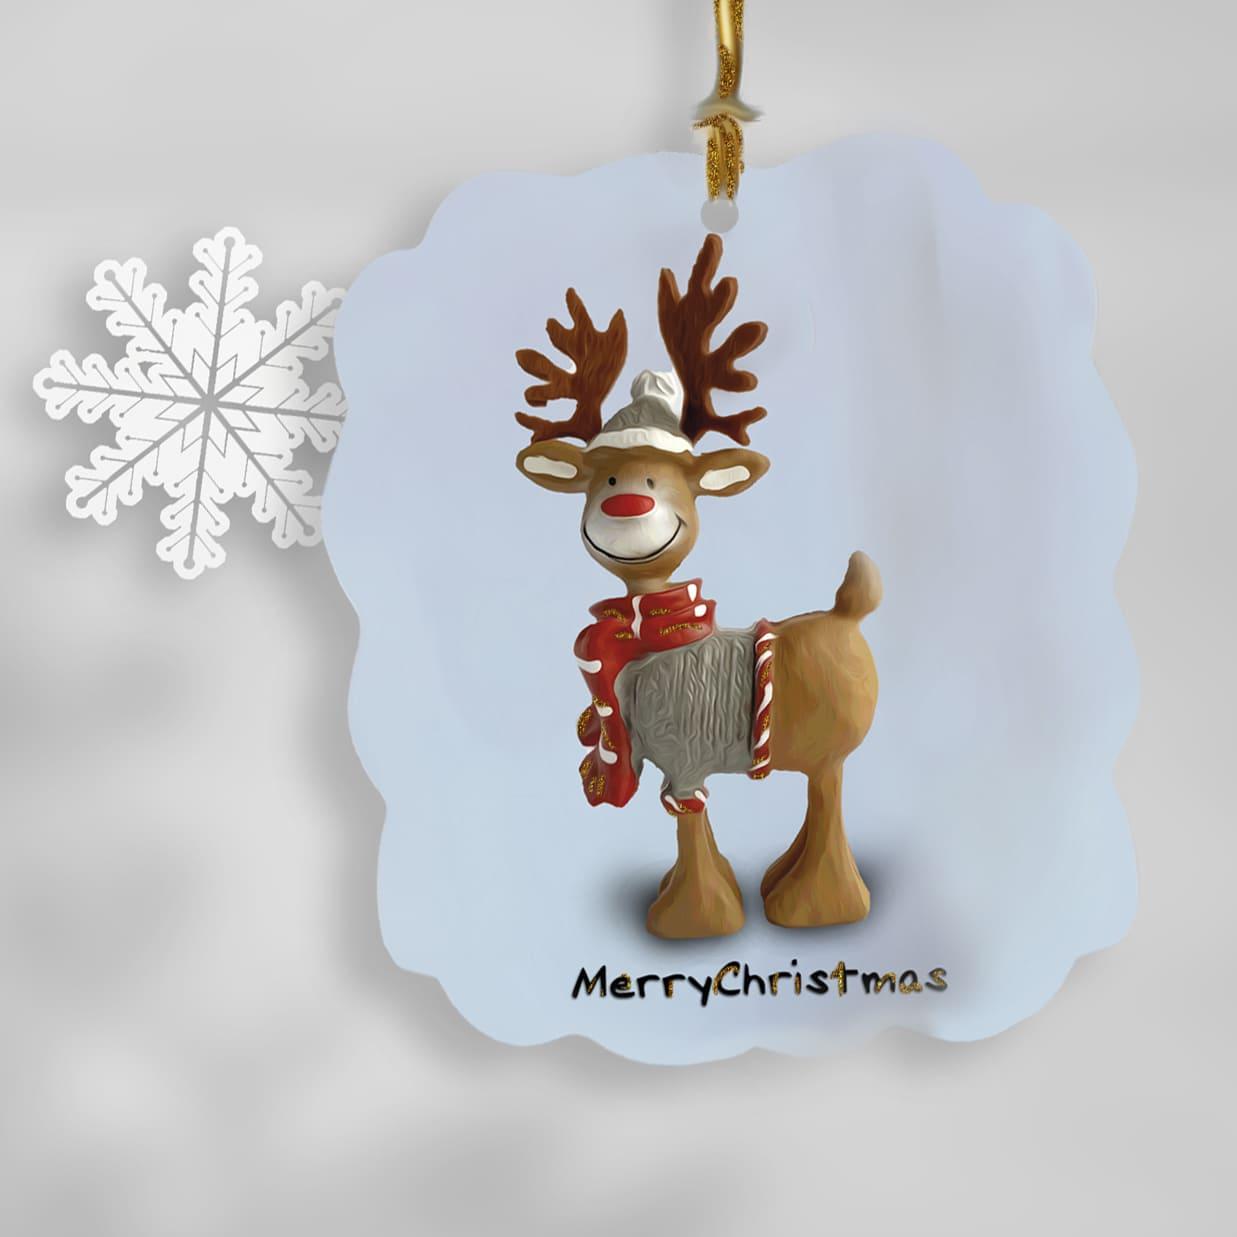 496 Christmas Illustrations: Christmas Vectors Bundle SVG, EPS, AI - g